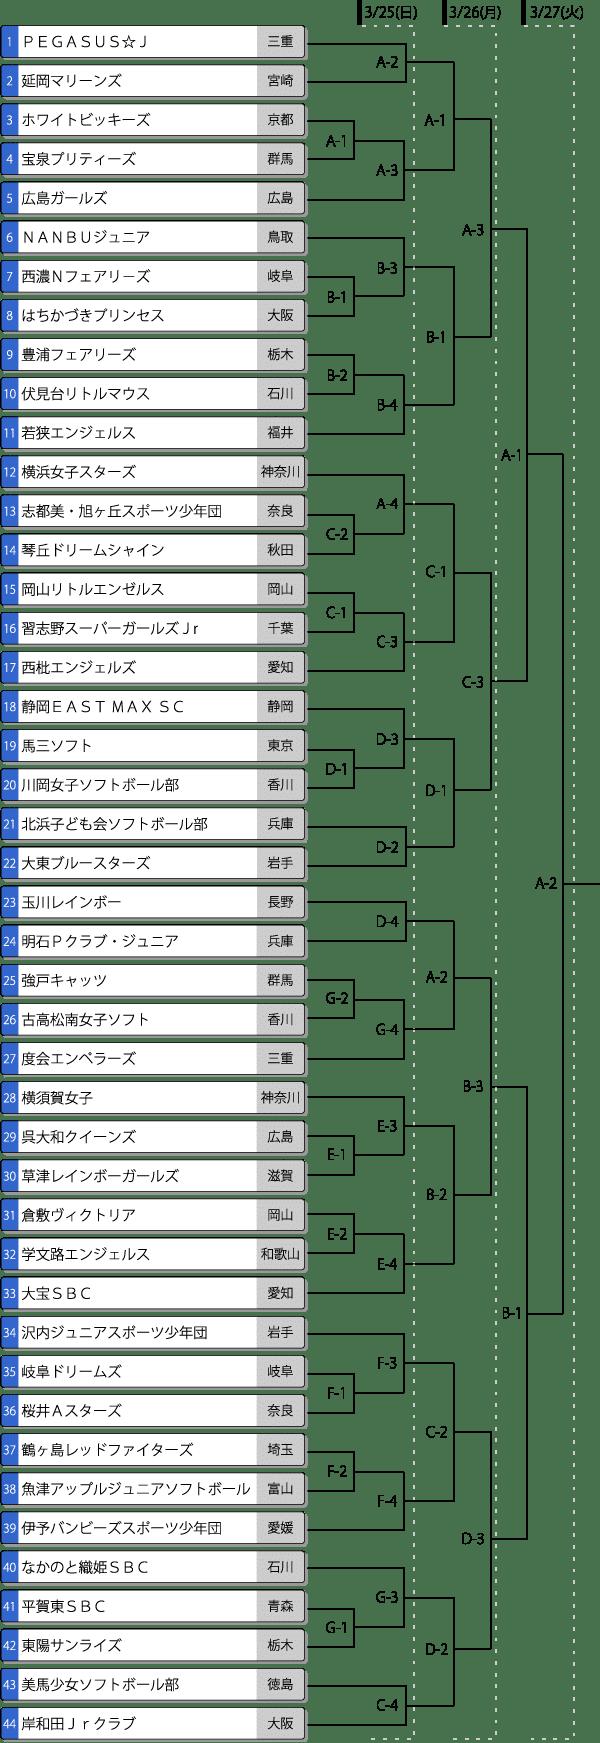 第11回春季全日本小学生女子大会組み合わせ表